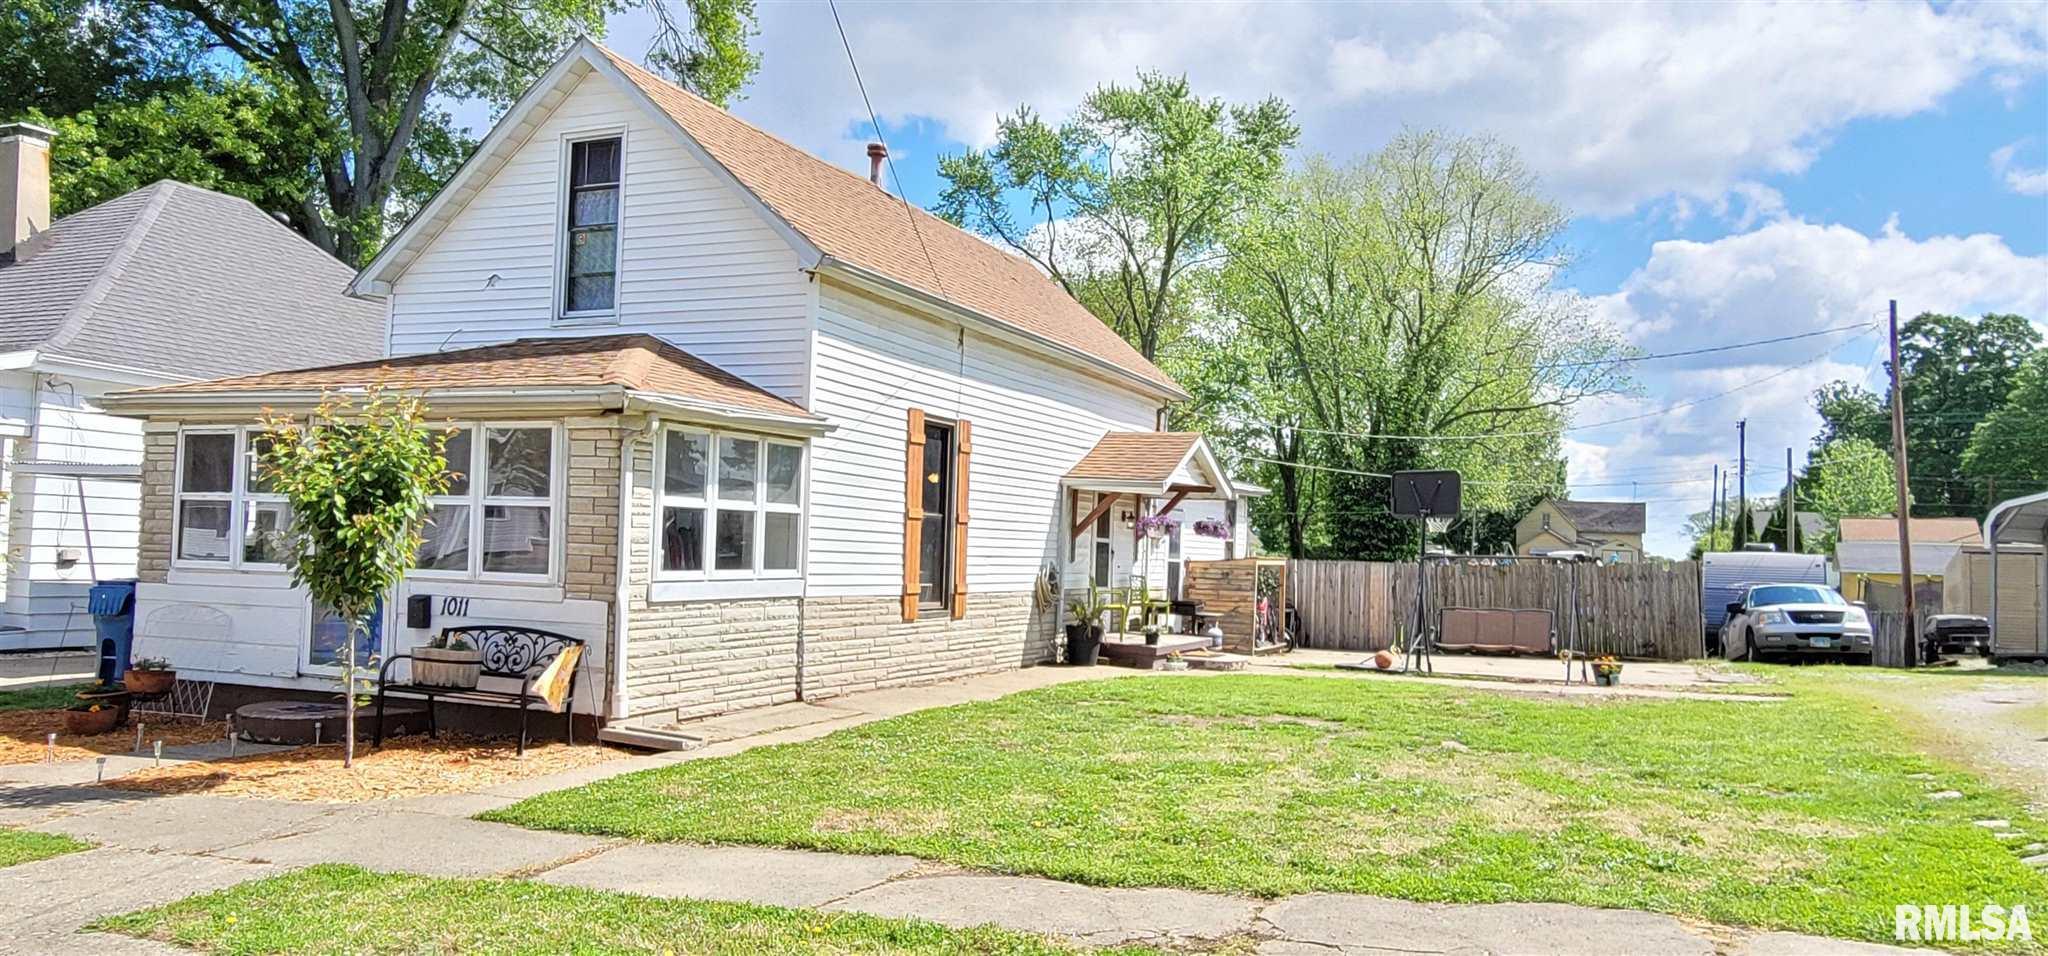 1011 N PEAR Property Photo - Mt Carmel, IL real estate listing